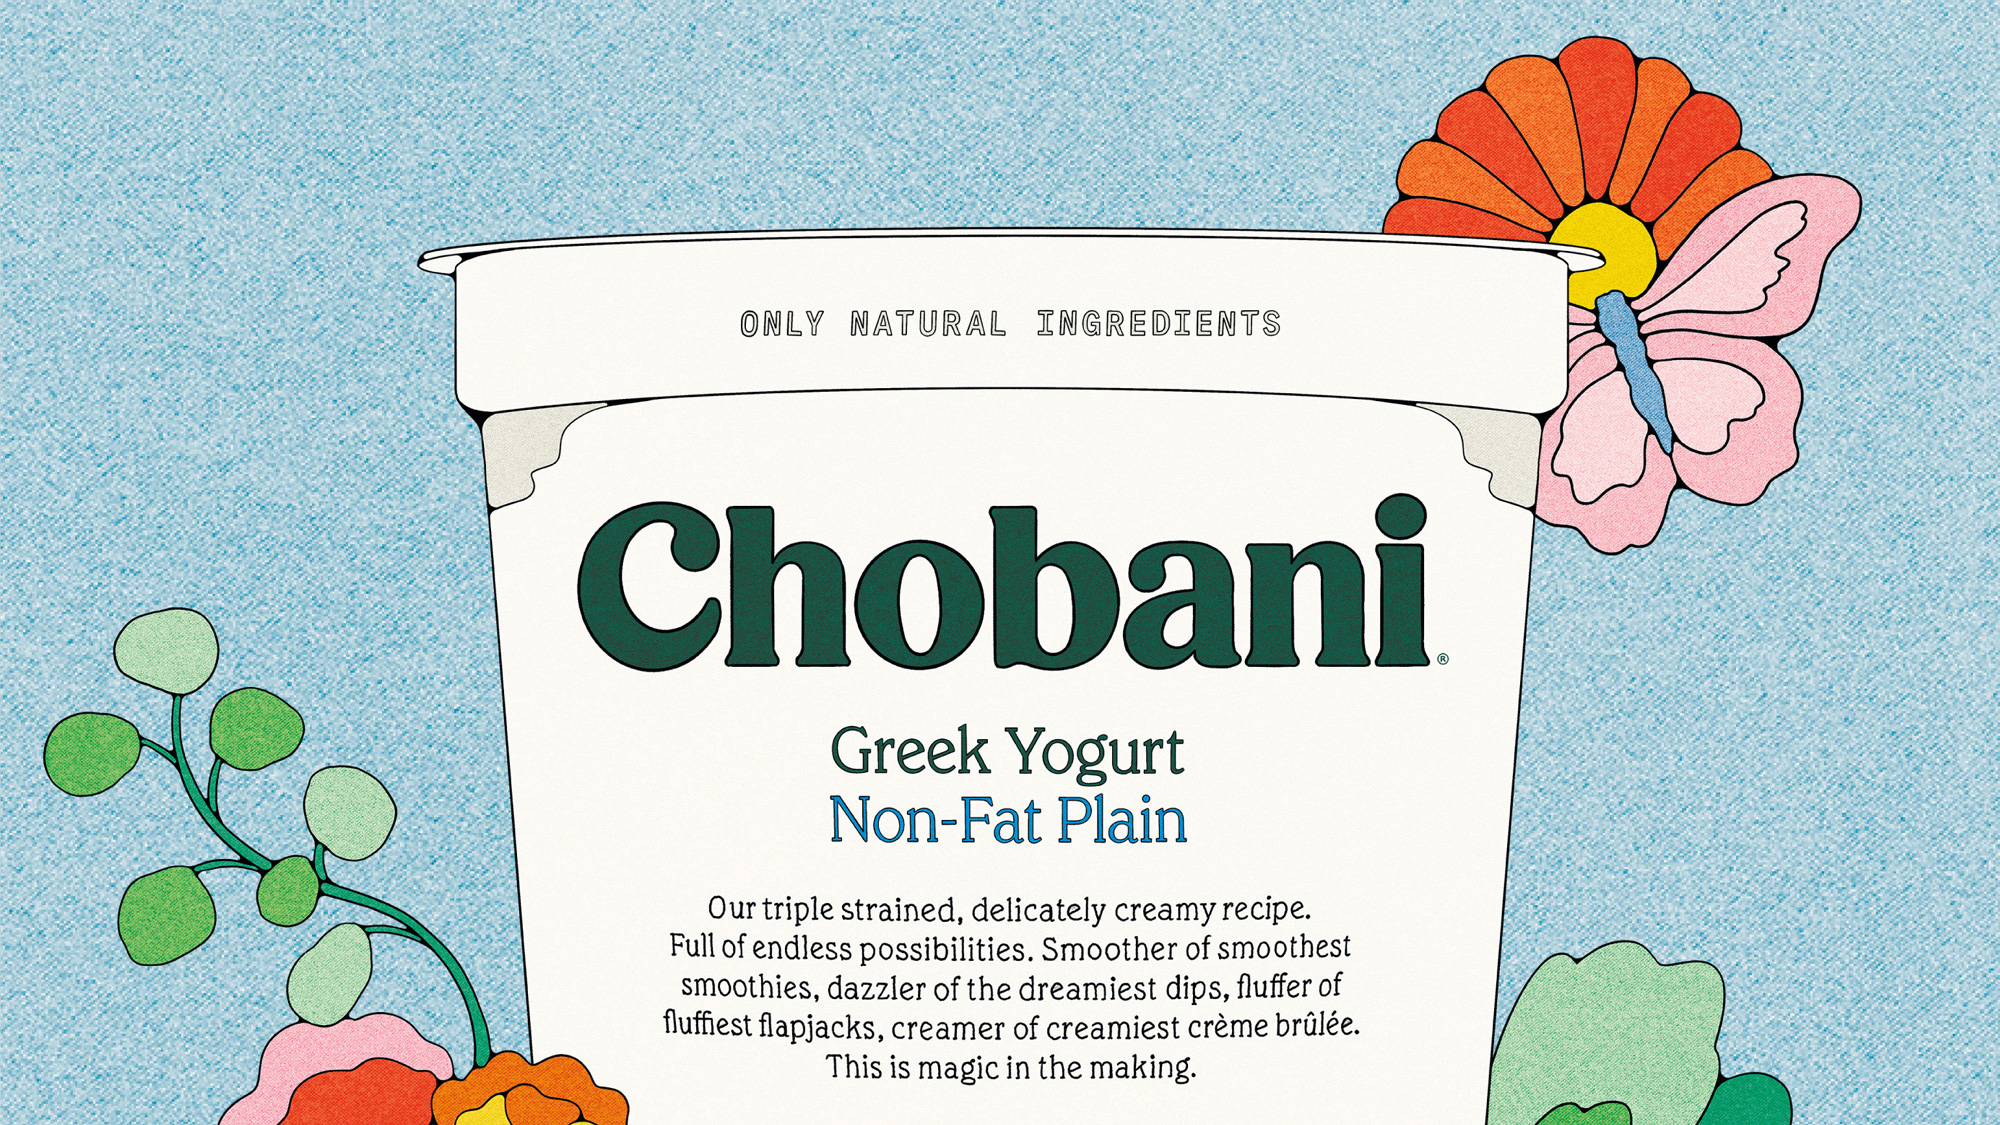 Chobani, Four Years Later